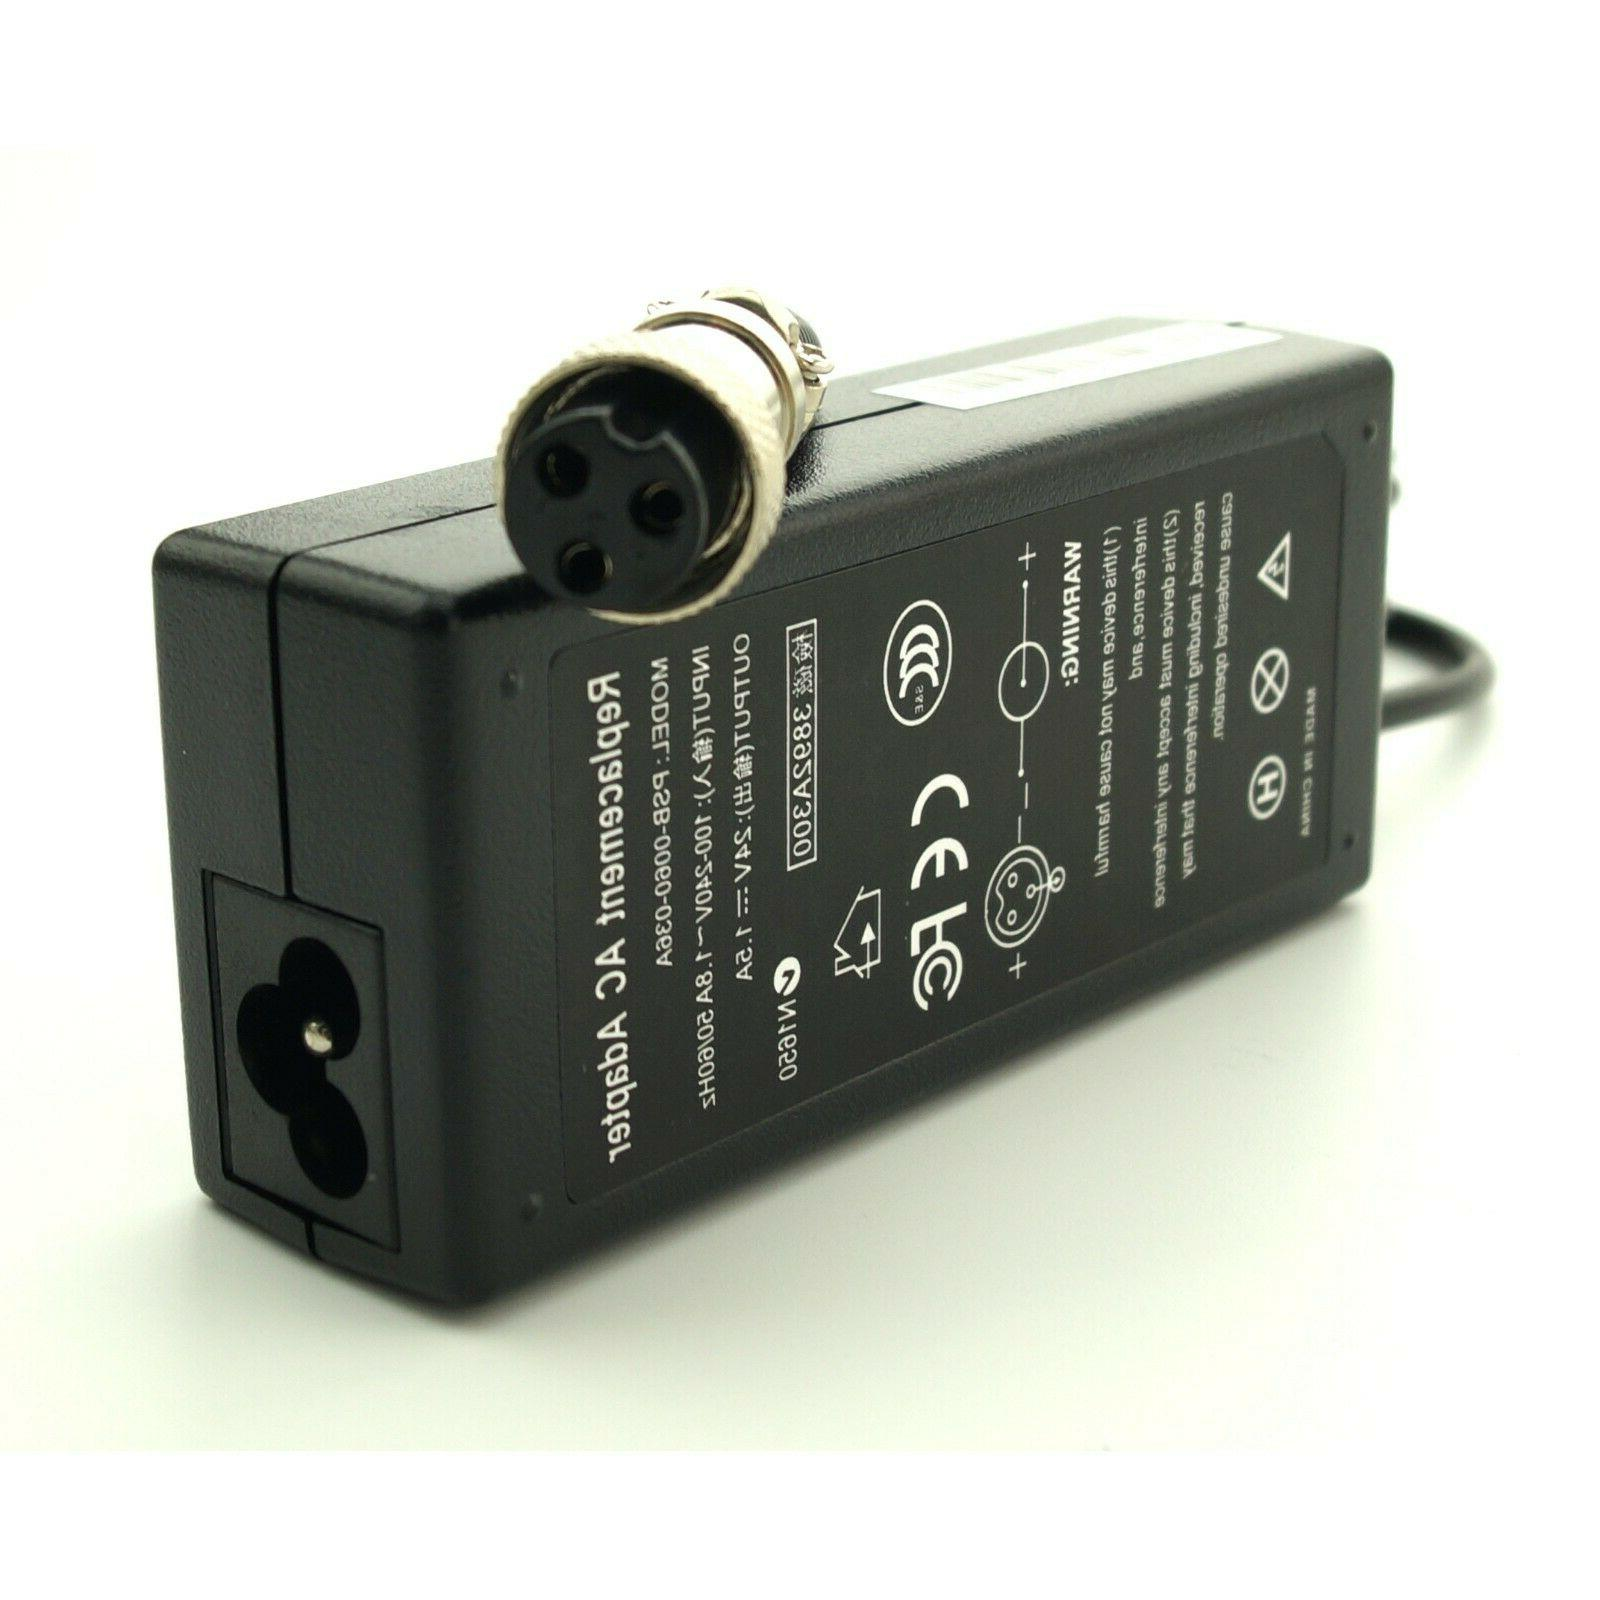 36W 1.5A Battery Charger Razor E175 E100 PowerCord